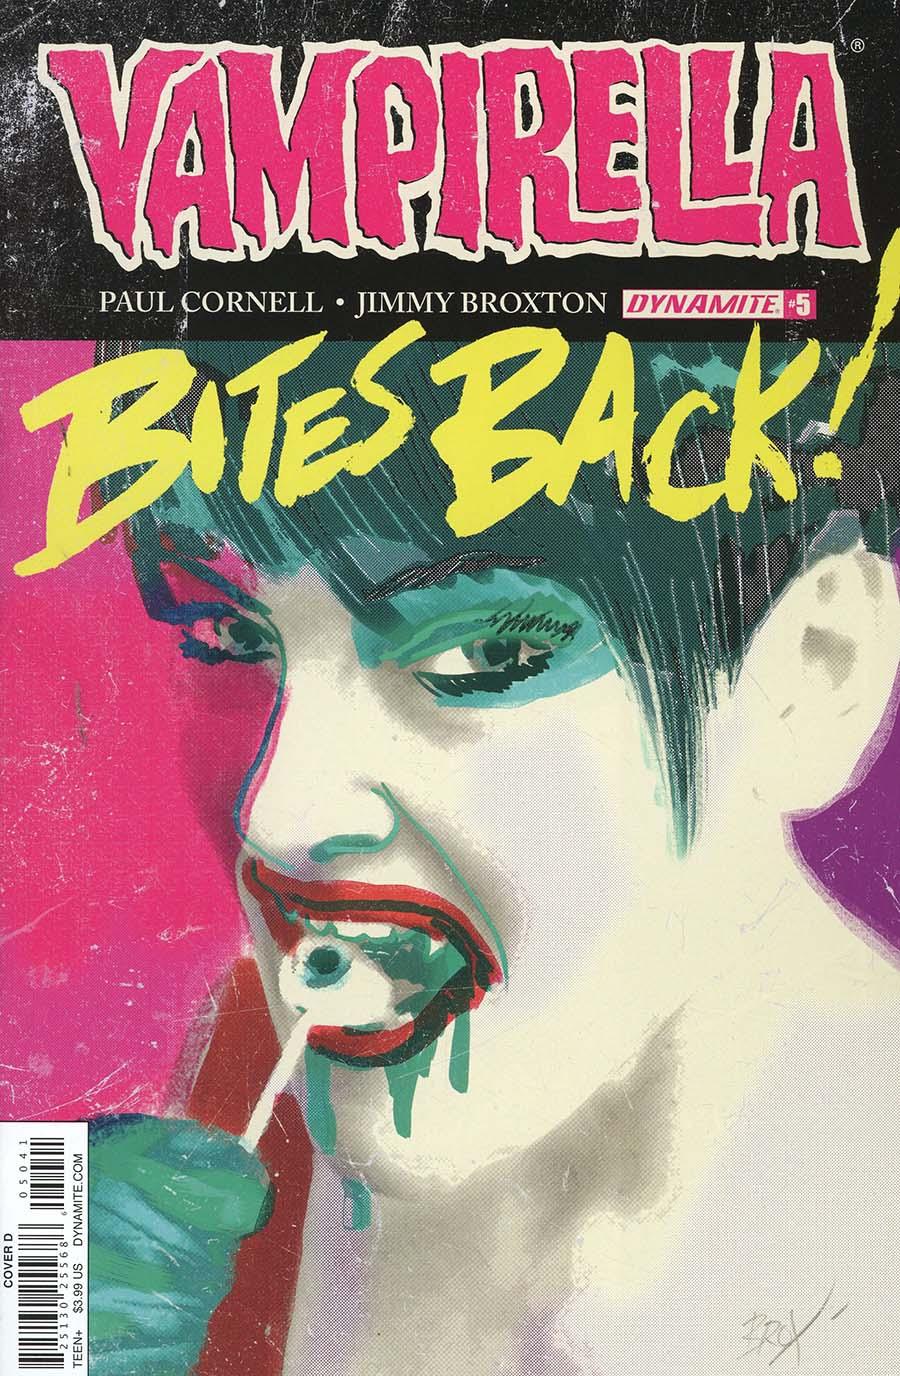 Vampirella Vol 7 #5 Cover D Variant Jimmy Broxton Subscription Cover